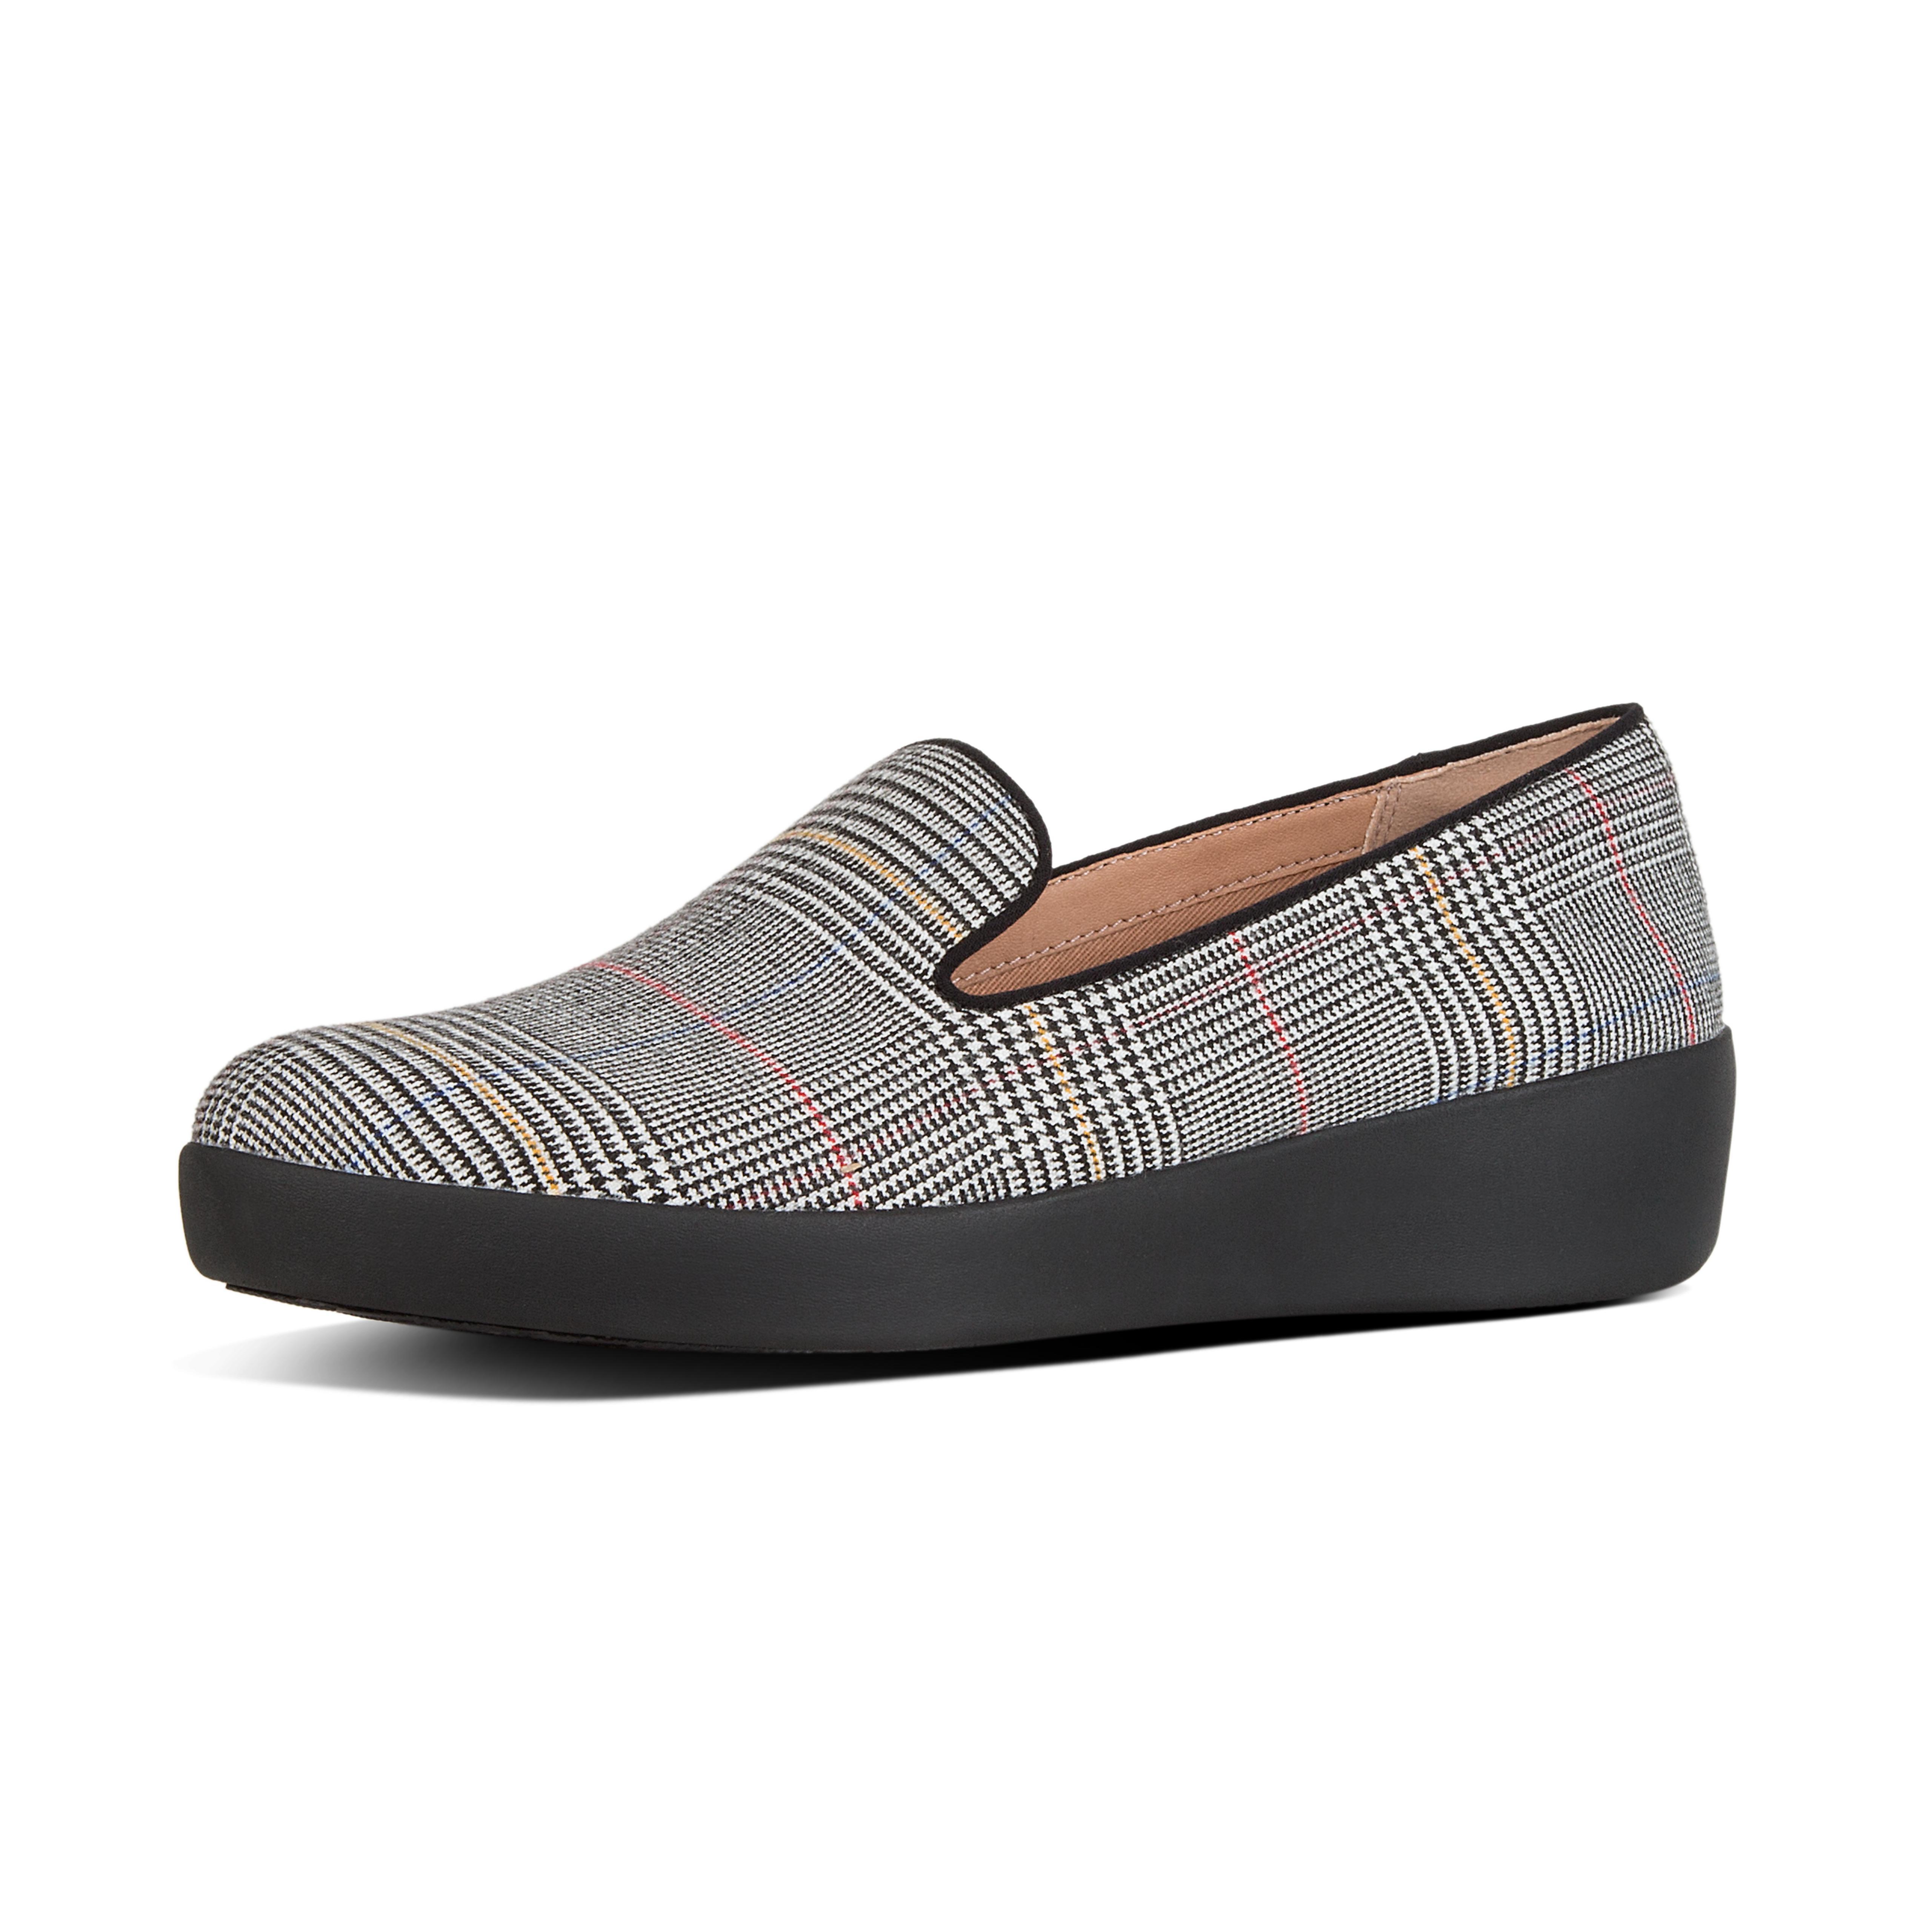 Audrey check slipper concrete w05 724?v=3